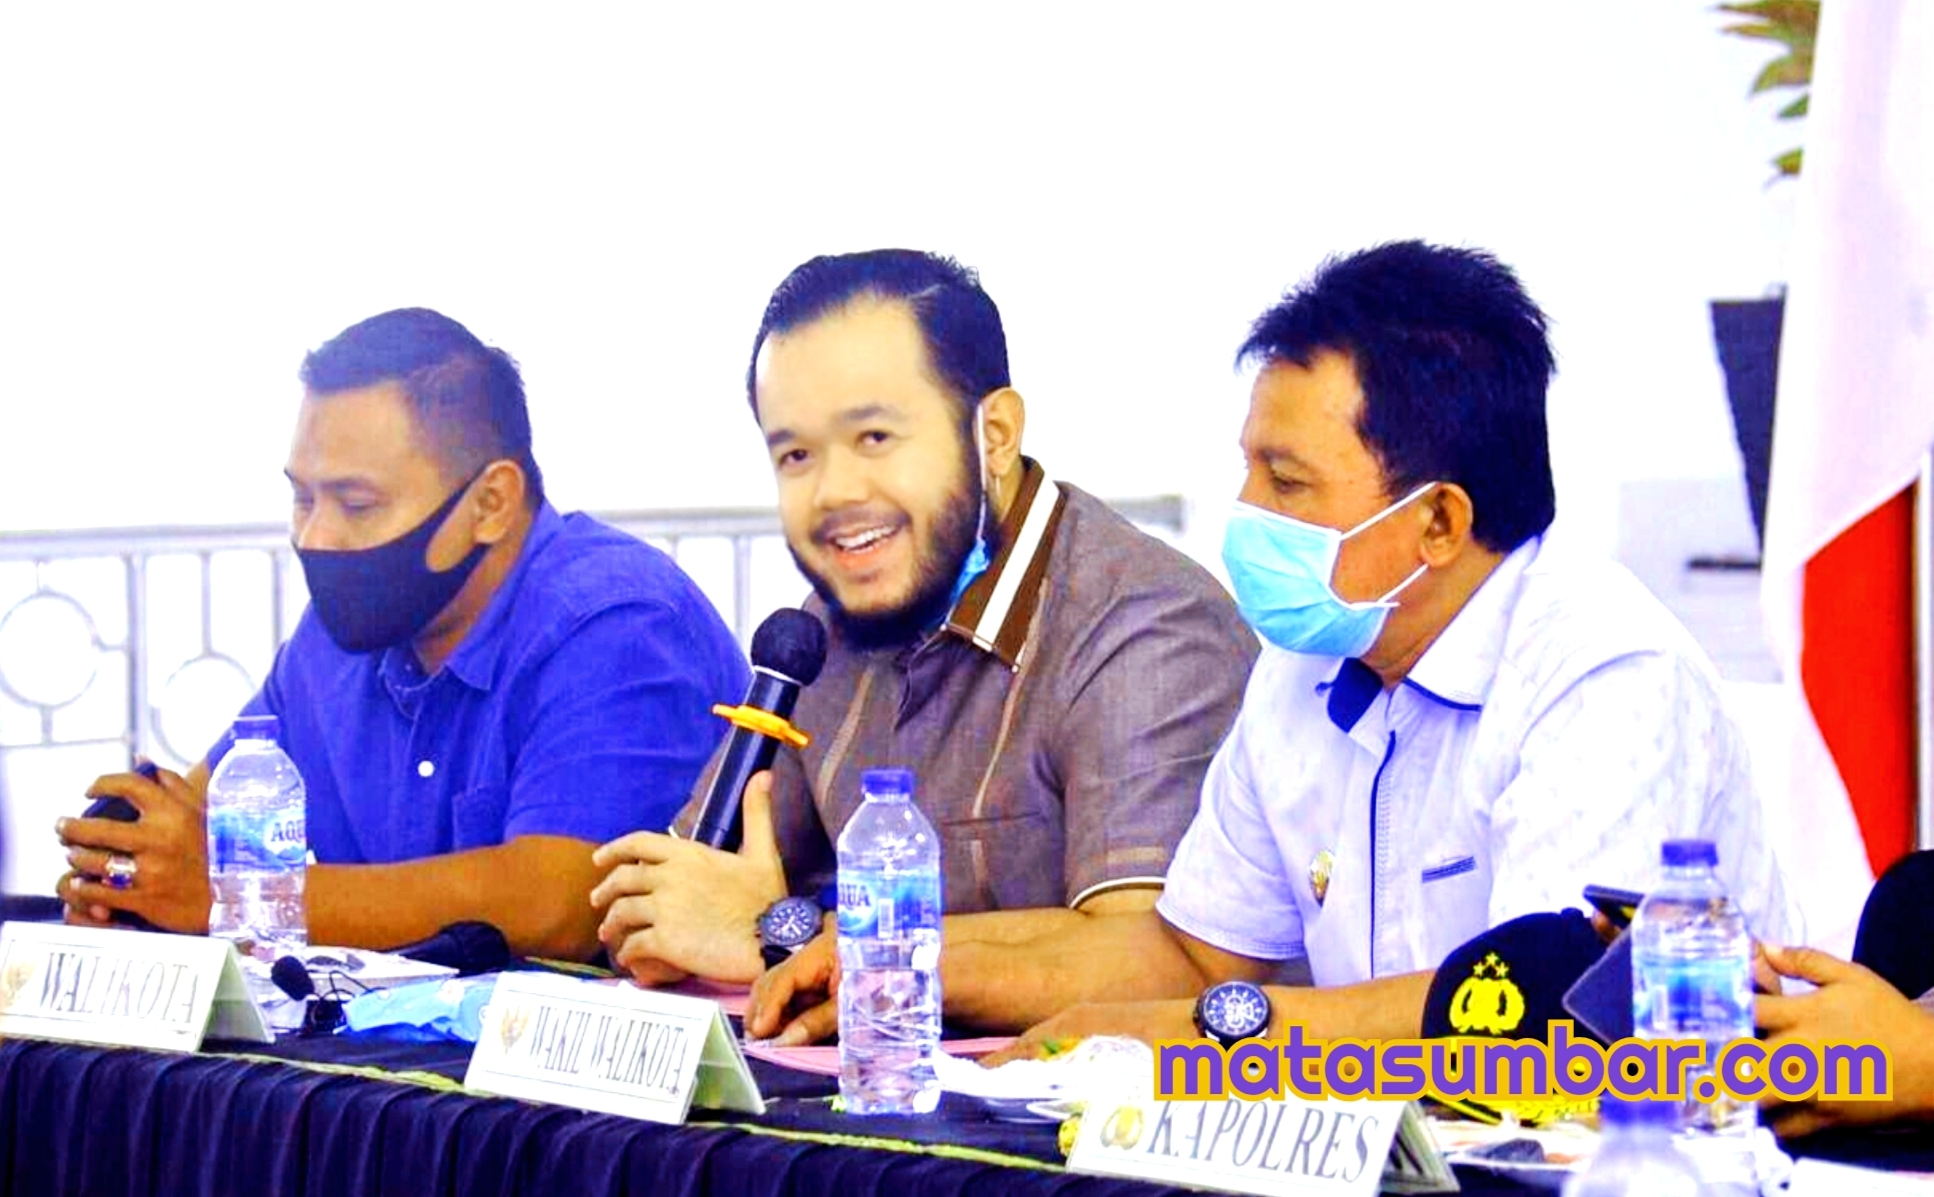 Padang Panjang Siap Jalankan Tatanan Normal Baru Aman Covid-19